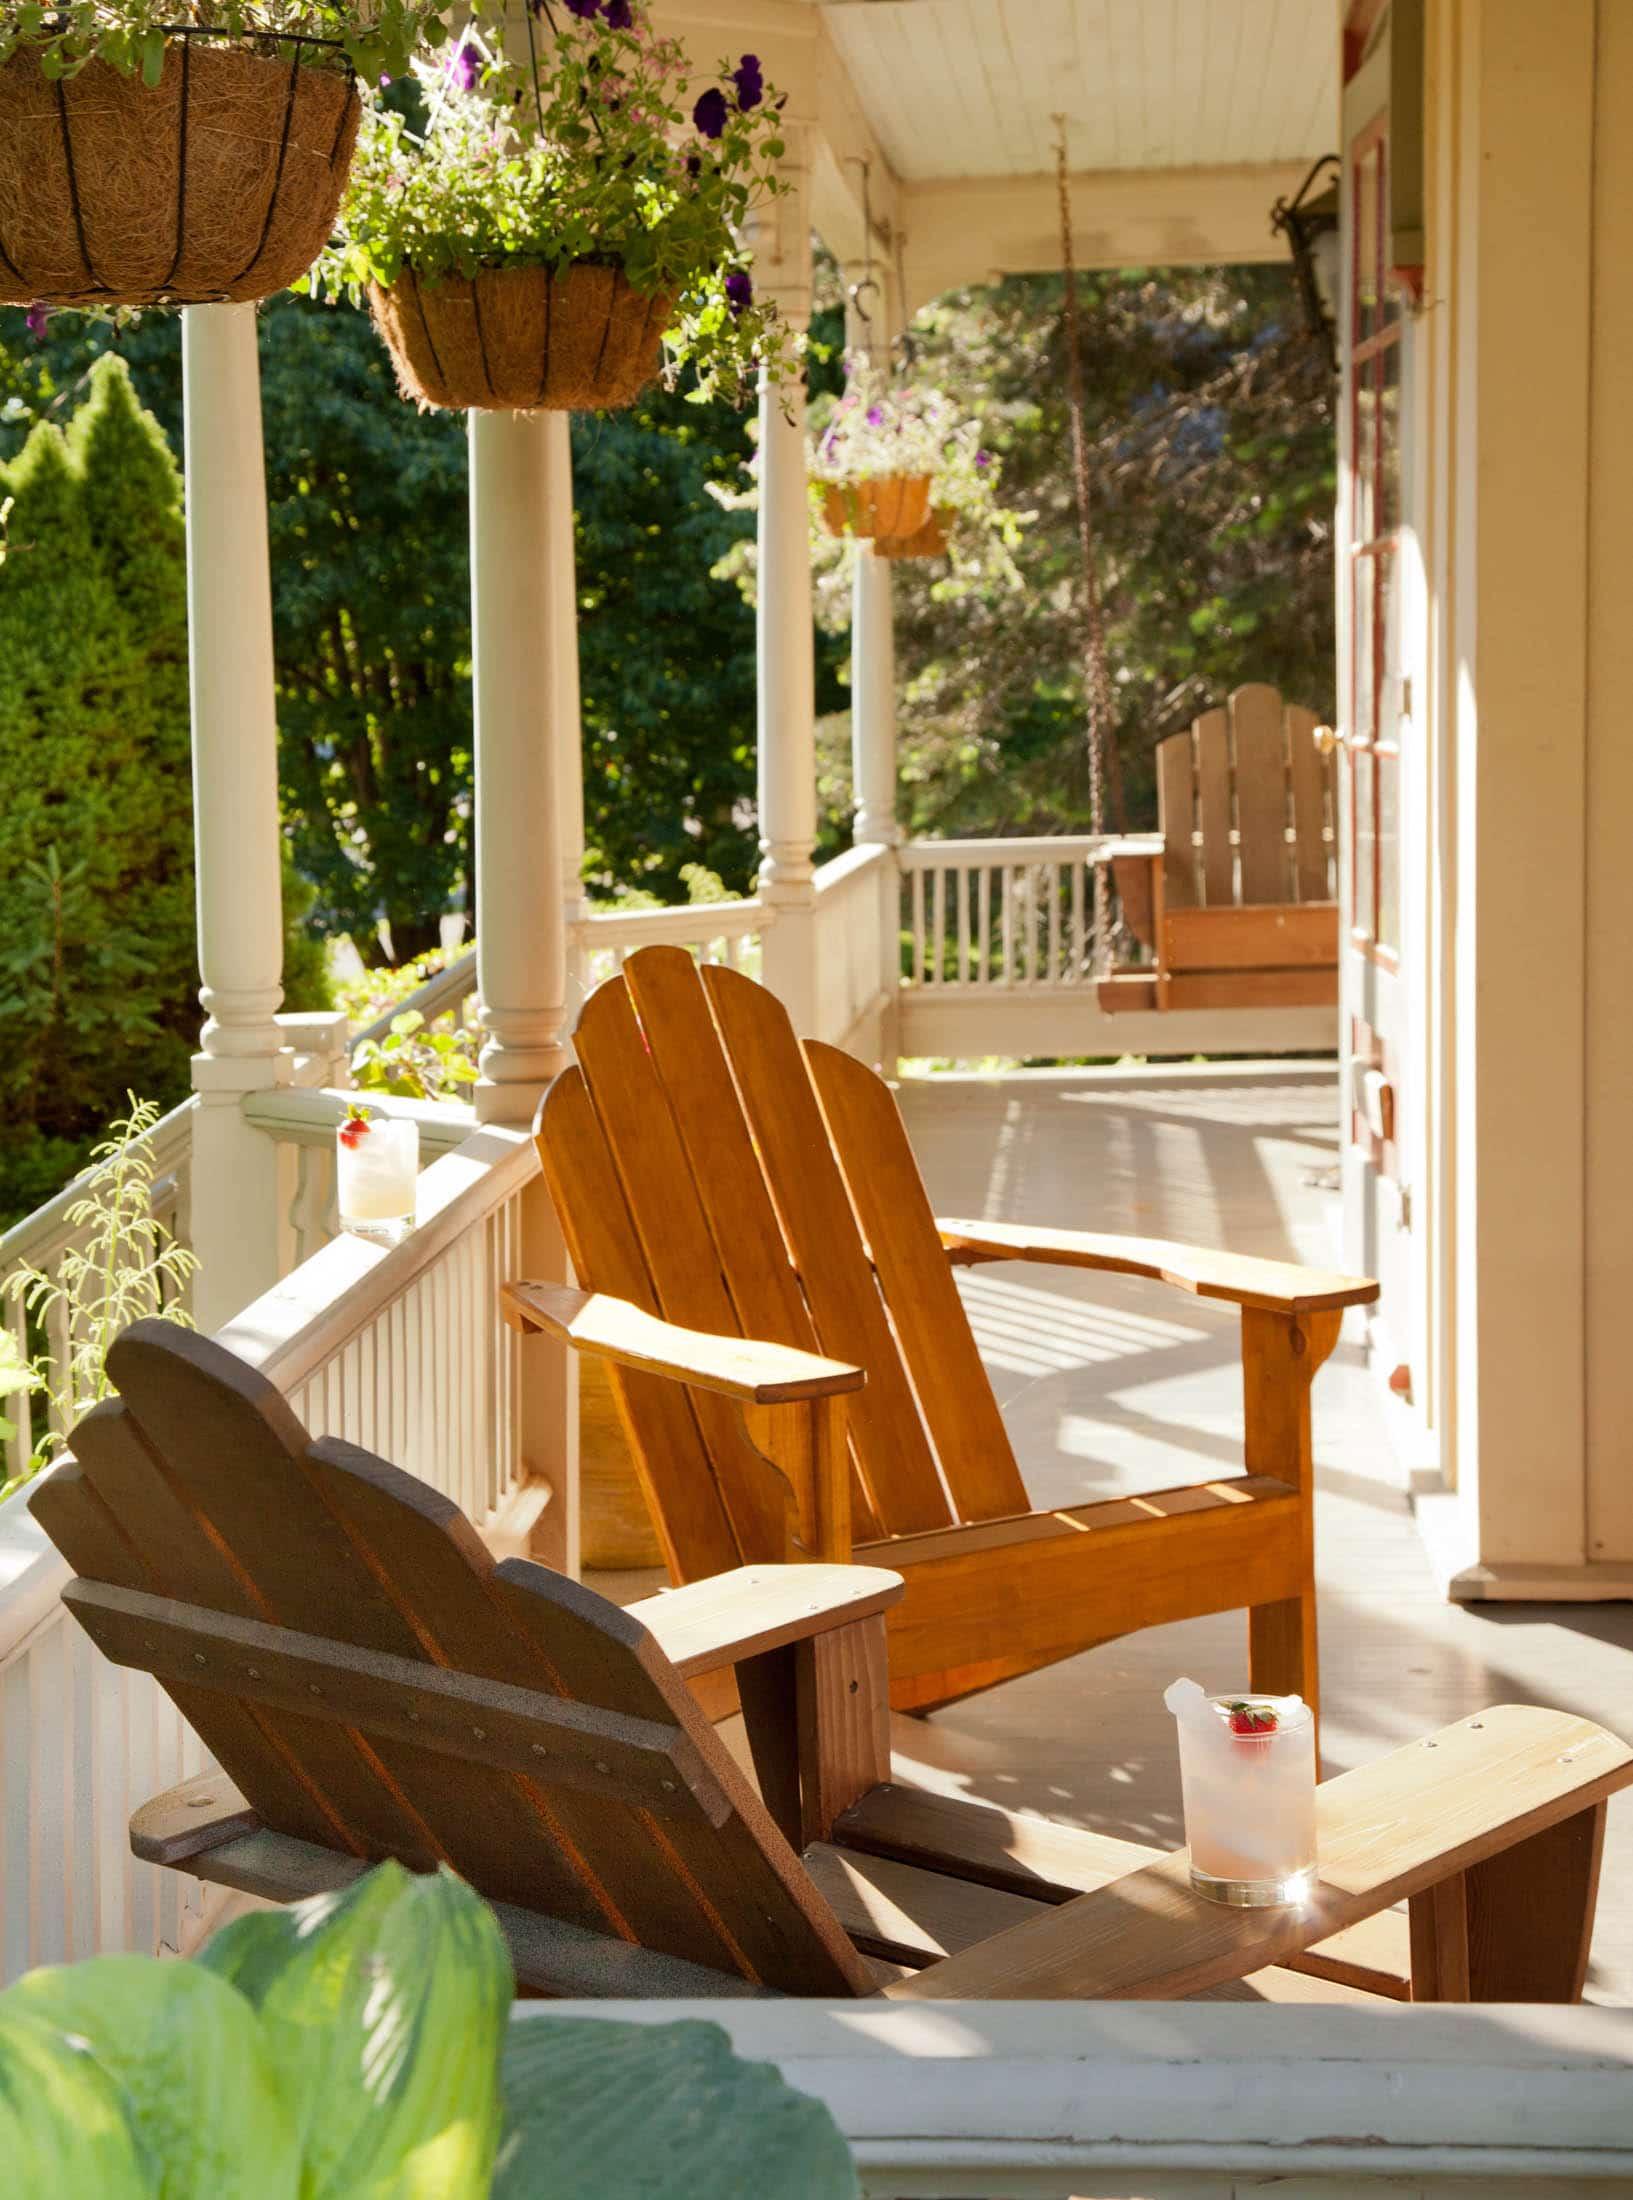 Inviting porch at Inn